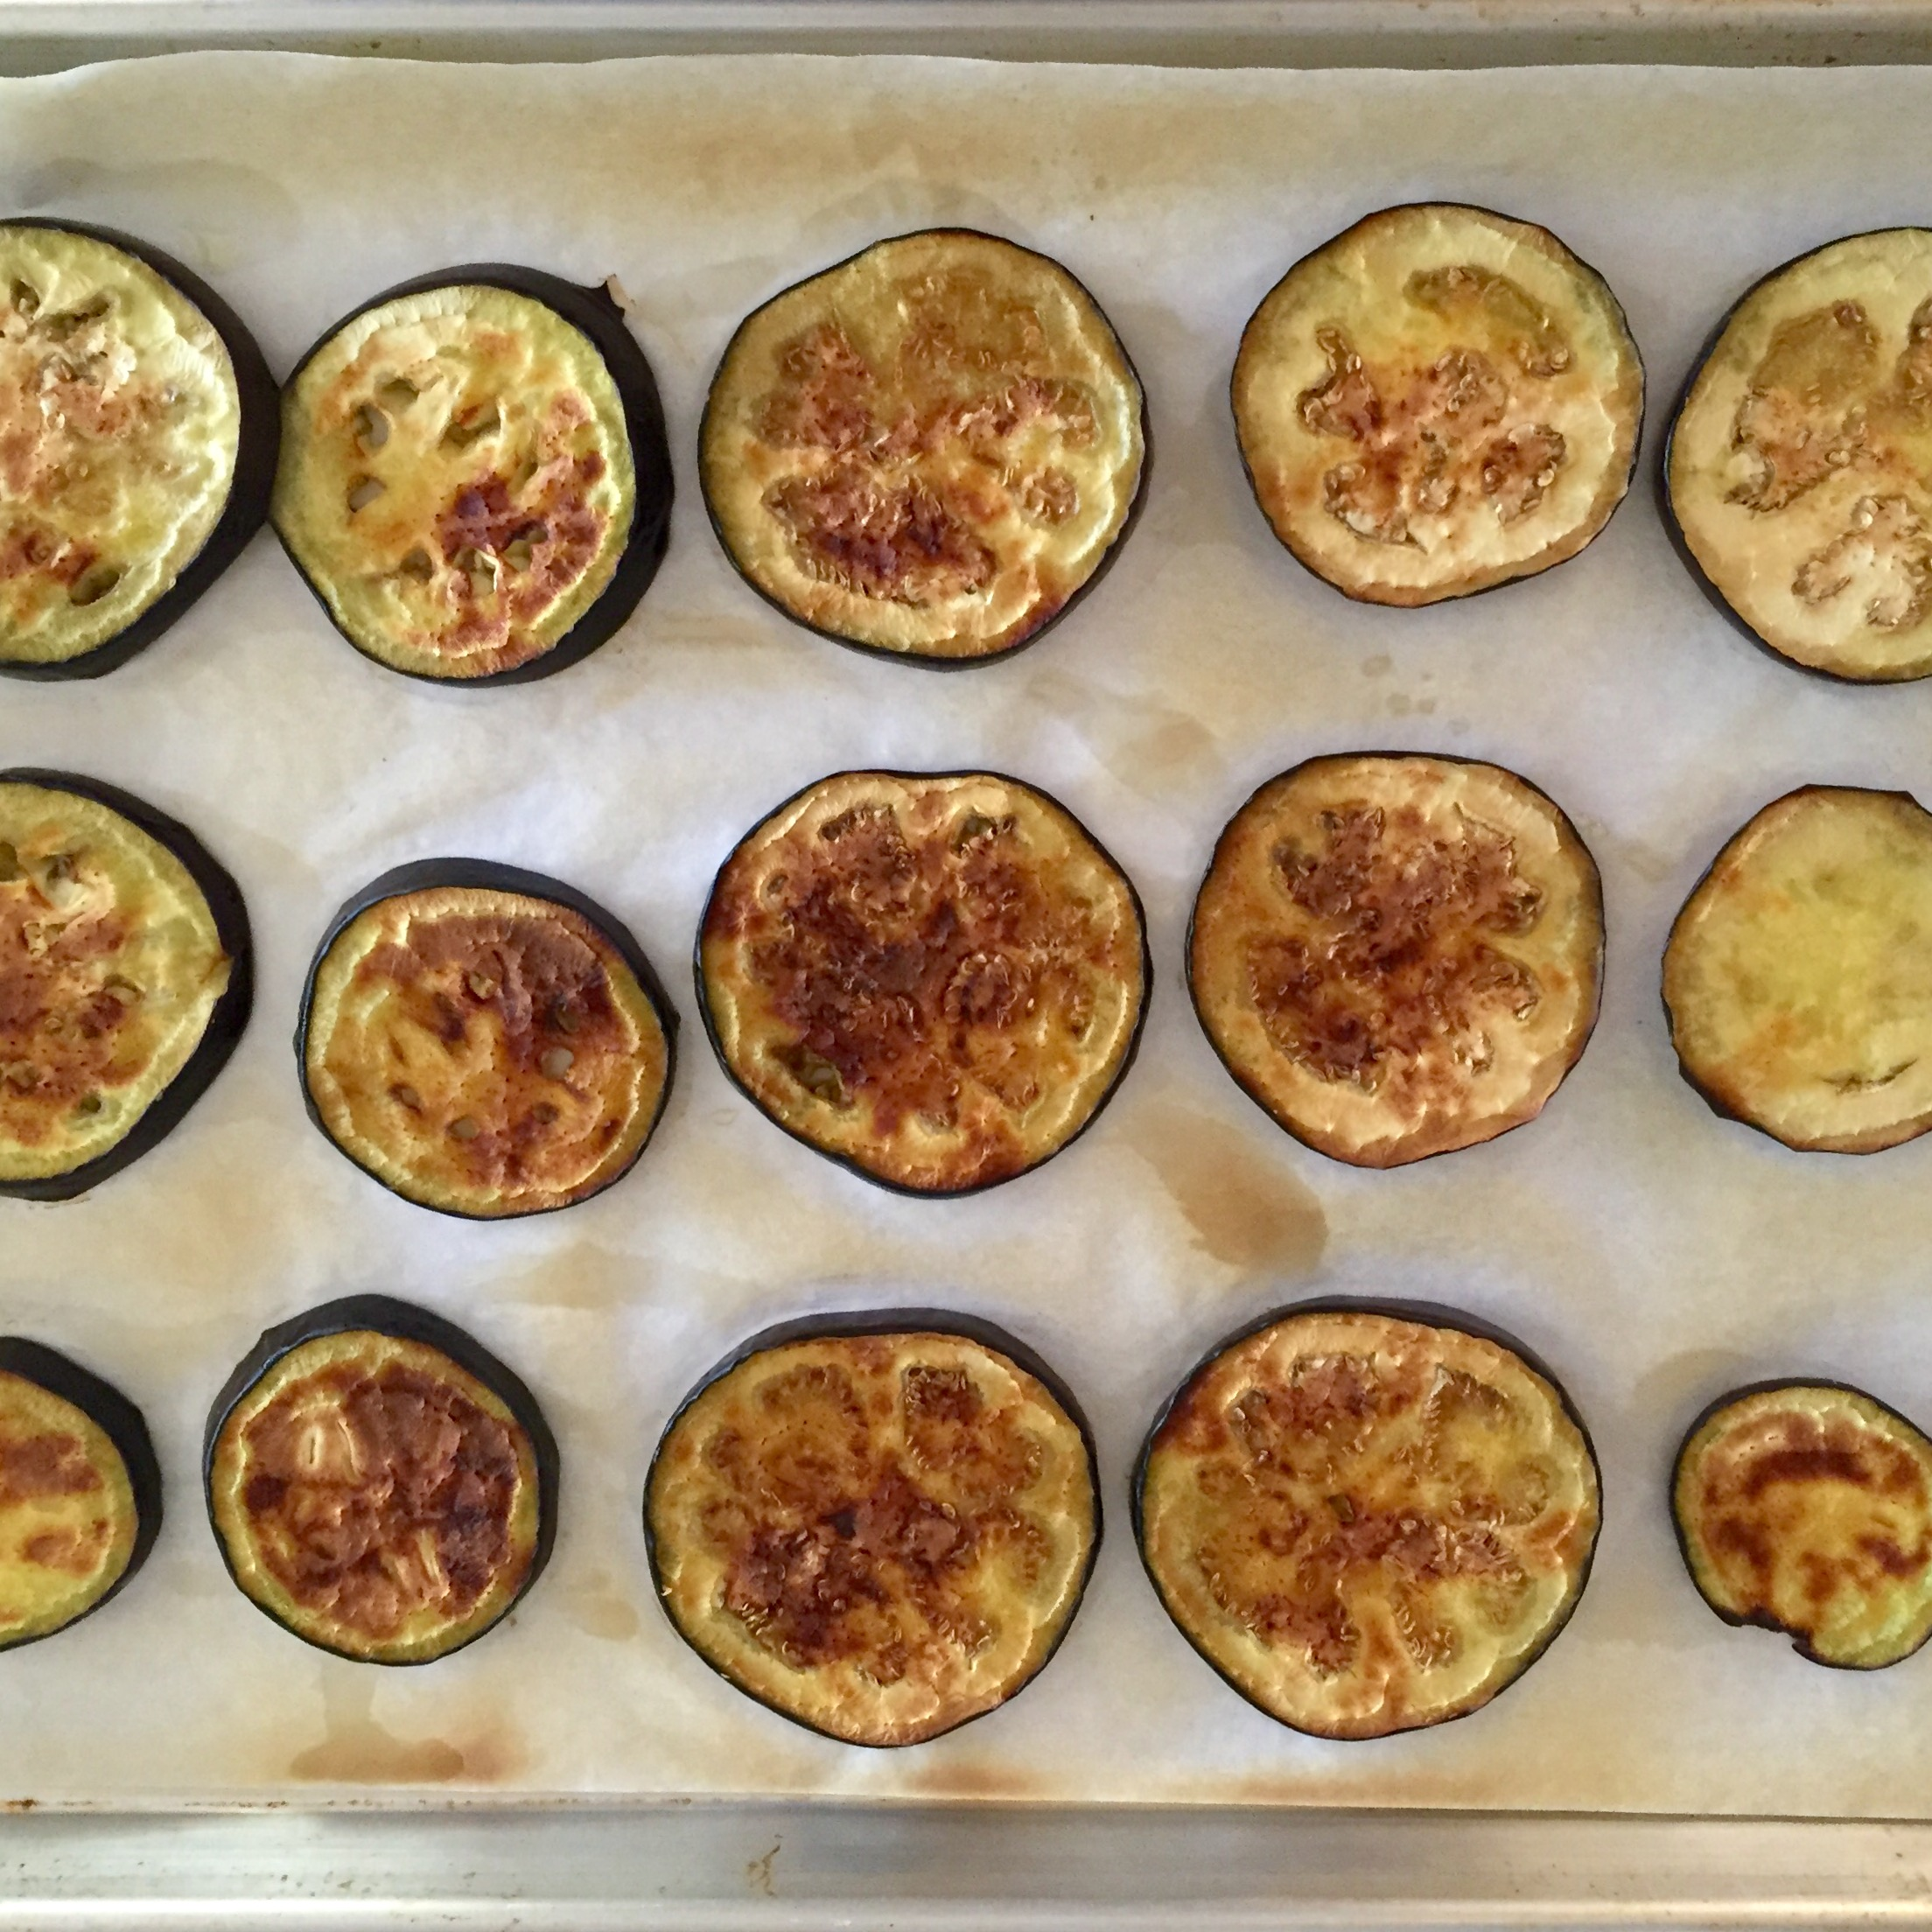 Eggplant_pan.jpg